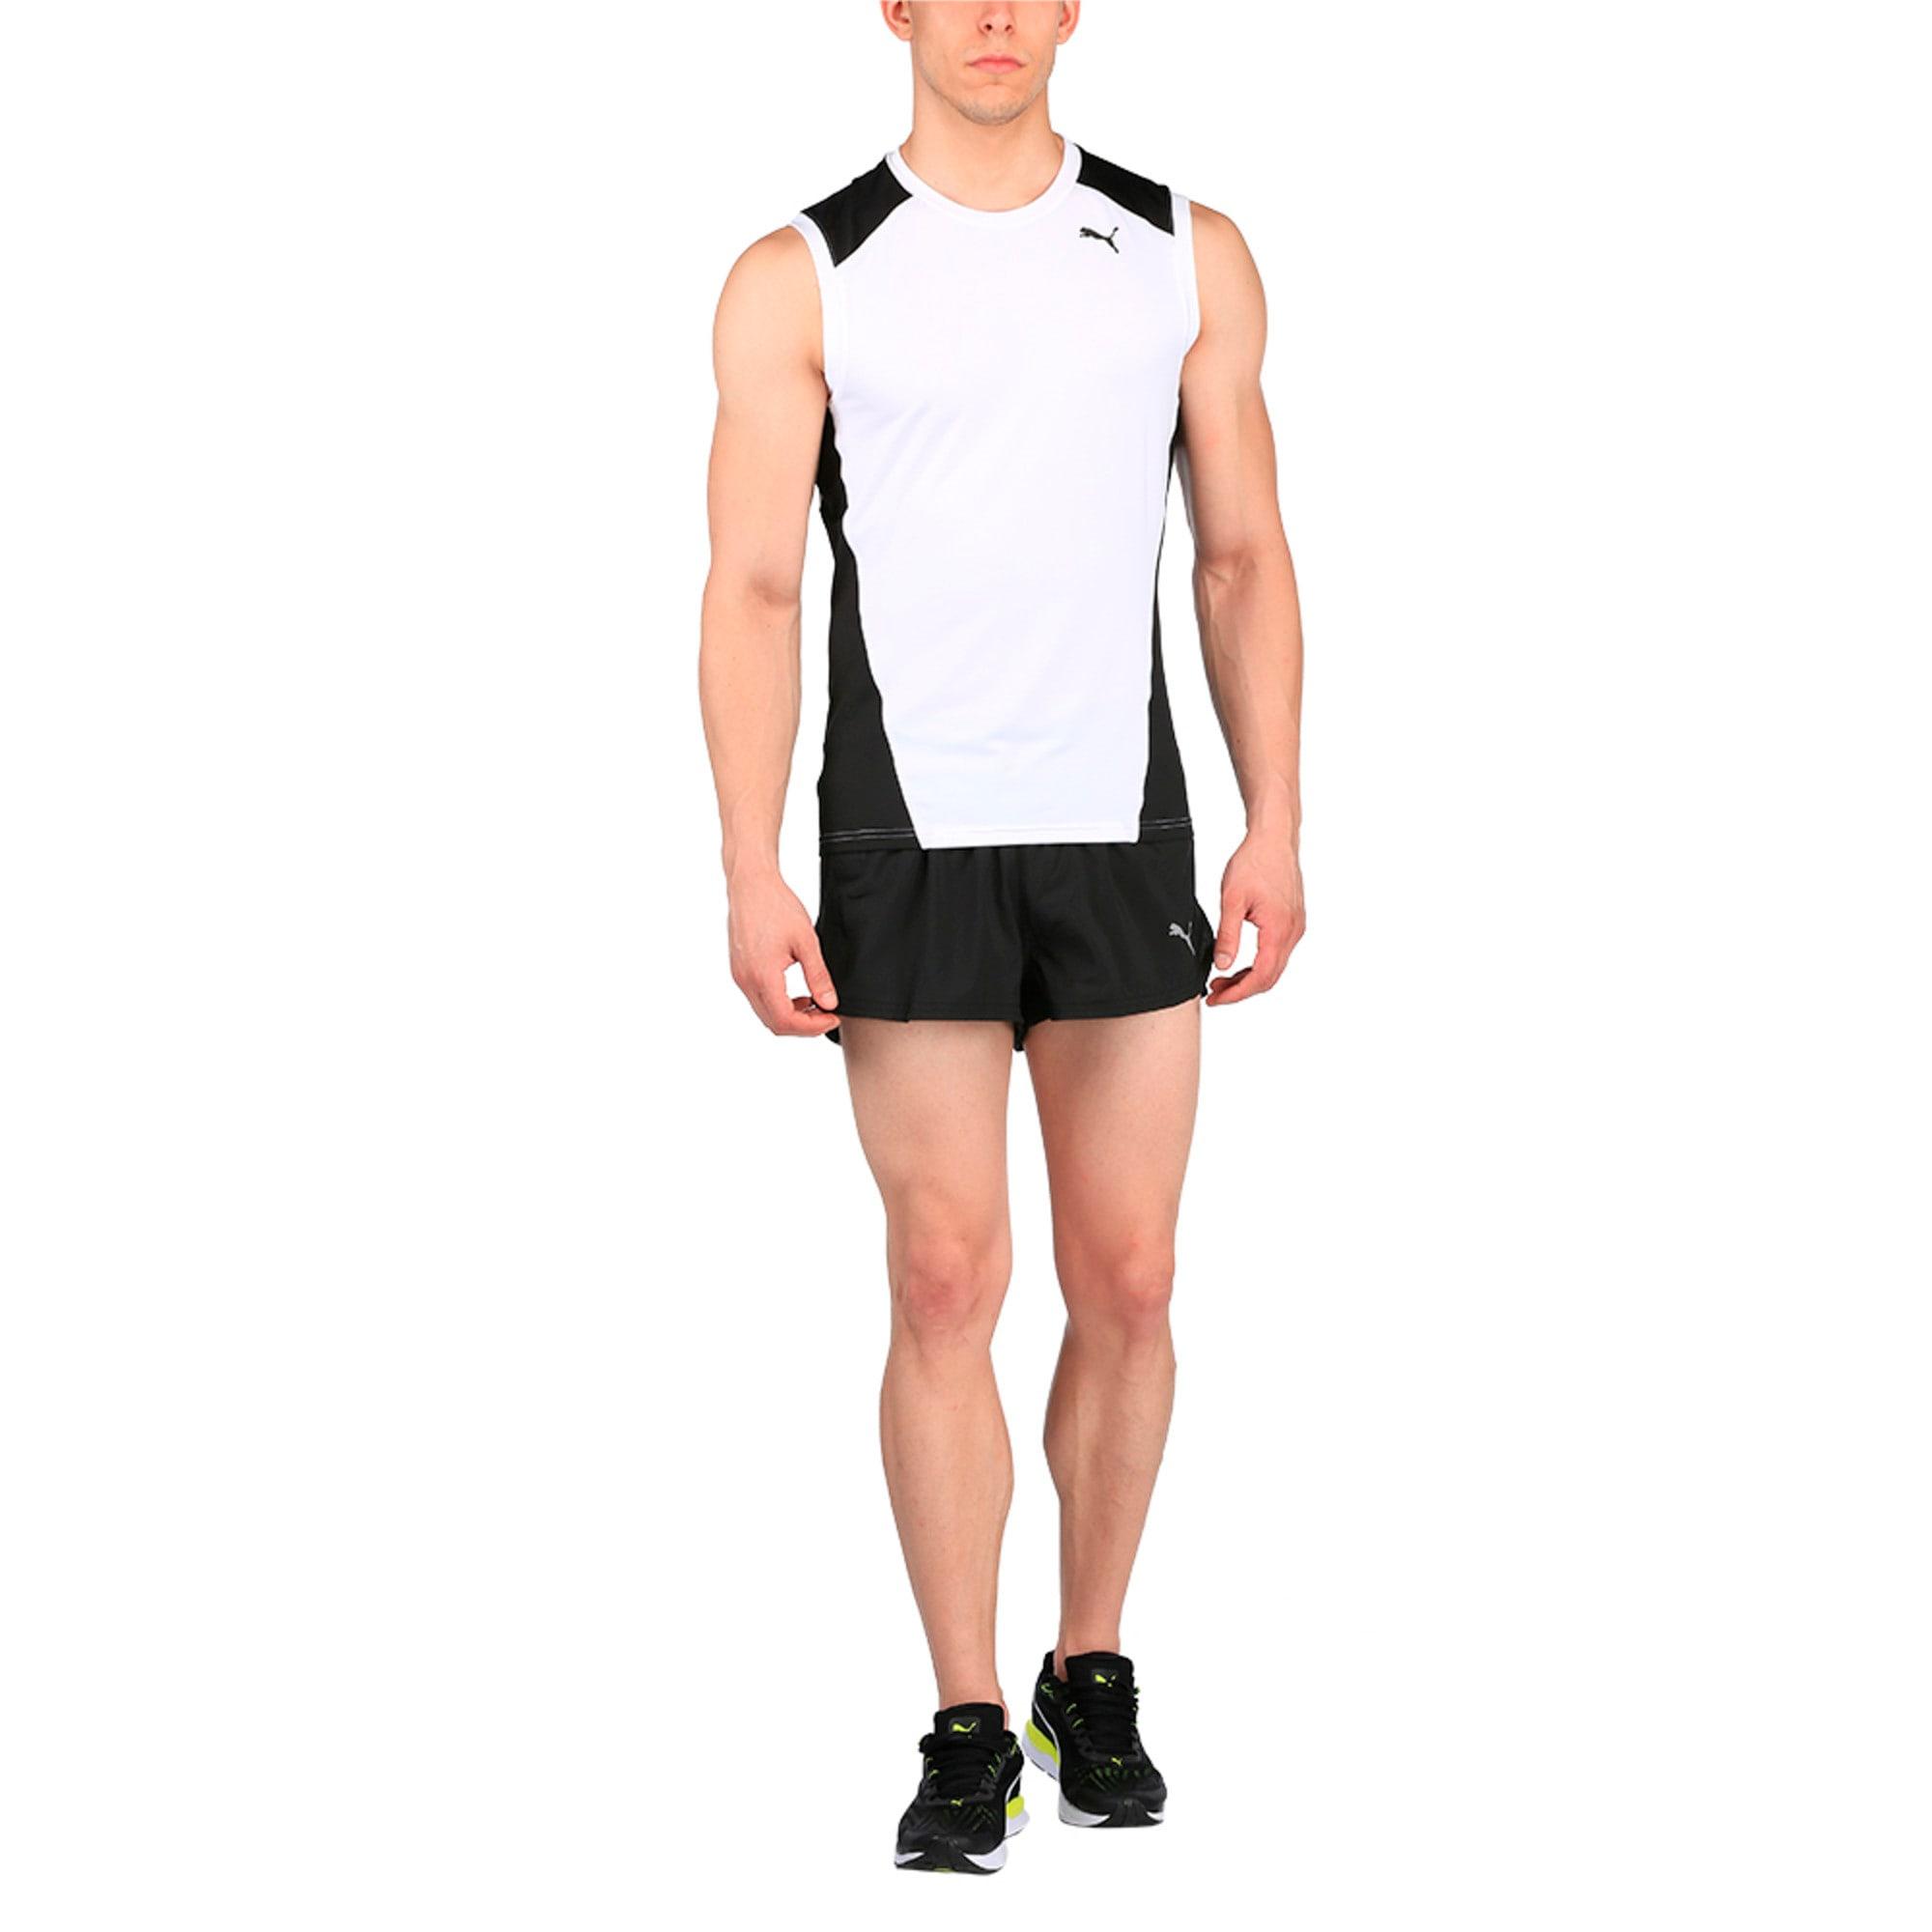 Thumbnail 3 of Running Men's Split Shorts, Puma Black, medium-IND